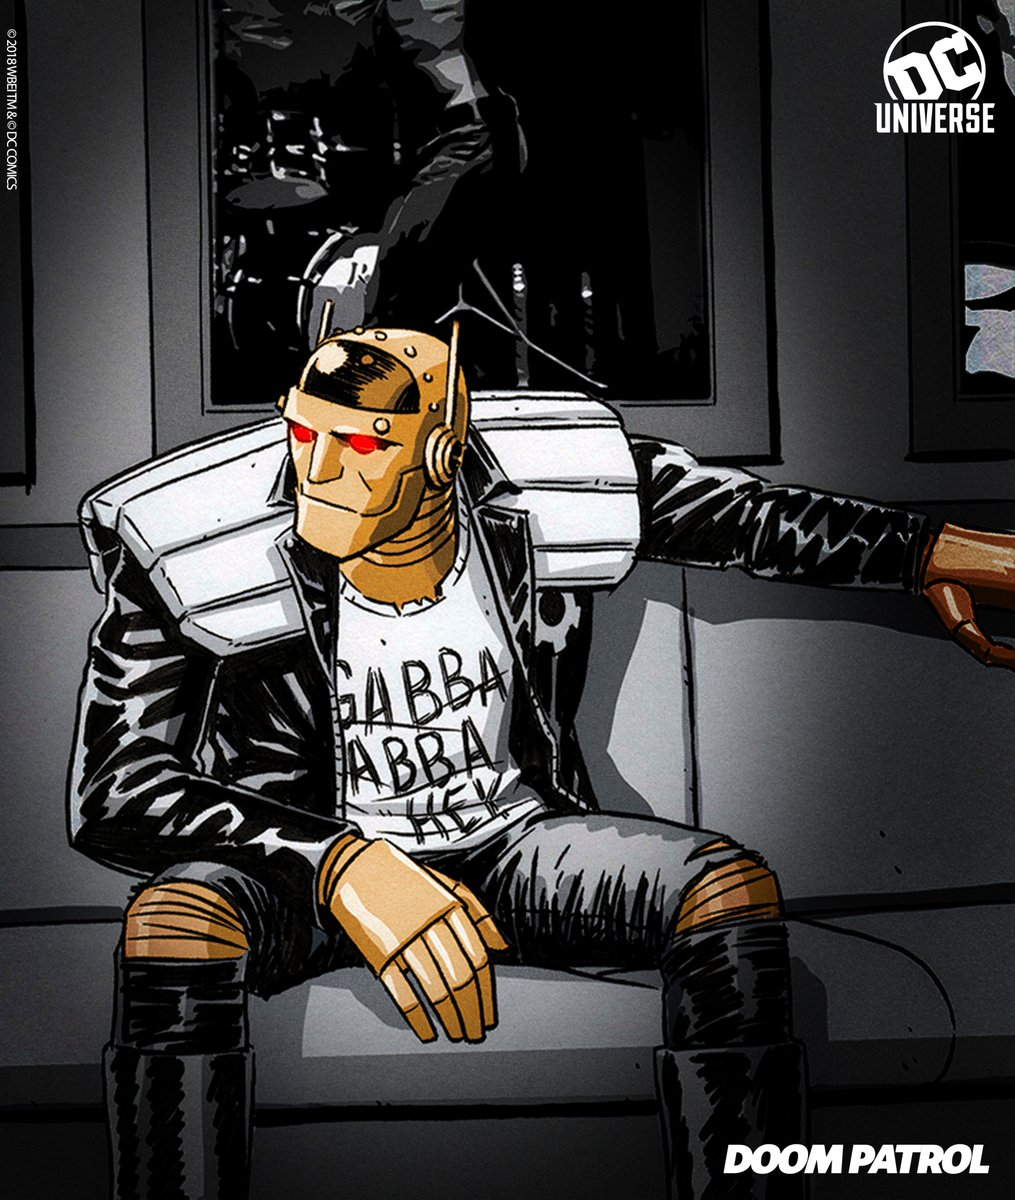 Doom Patrol Casts Brendan Fraser As Robotman The Beat